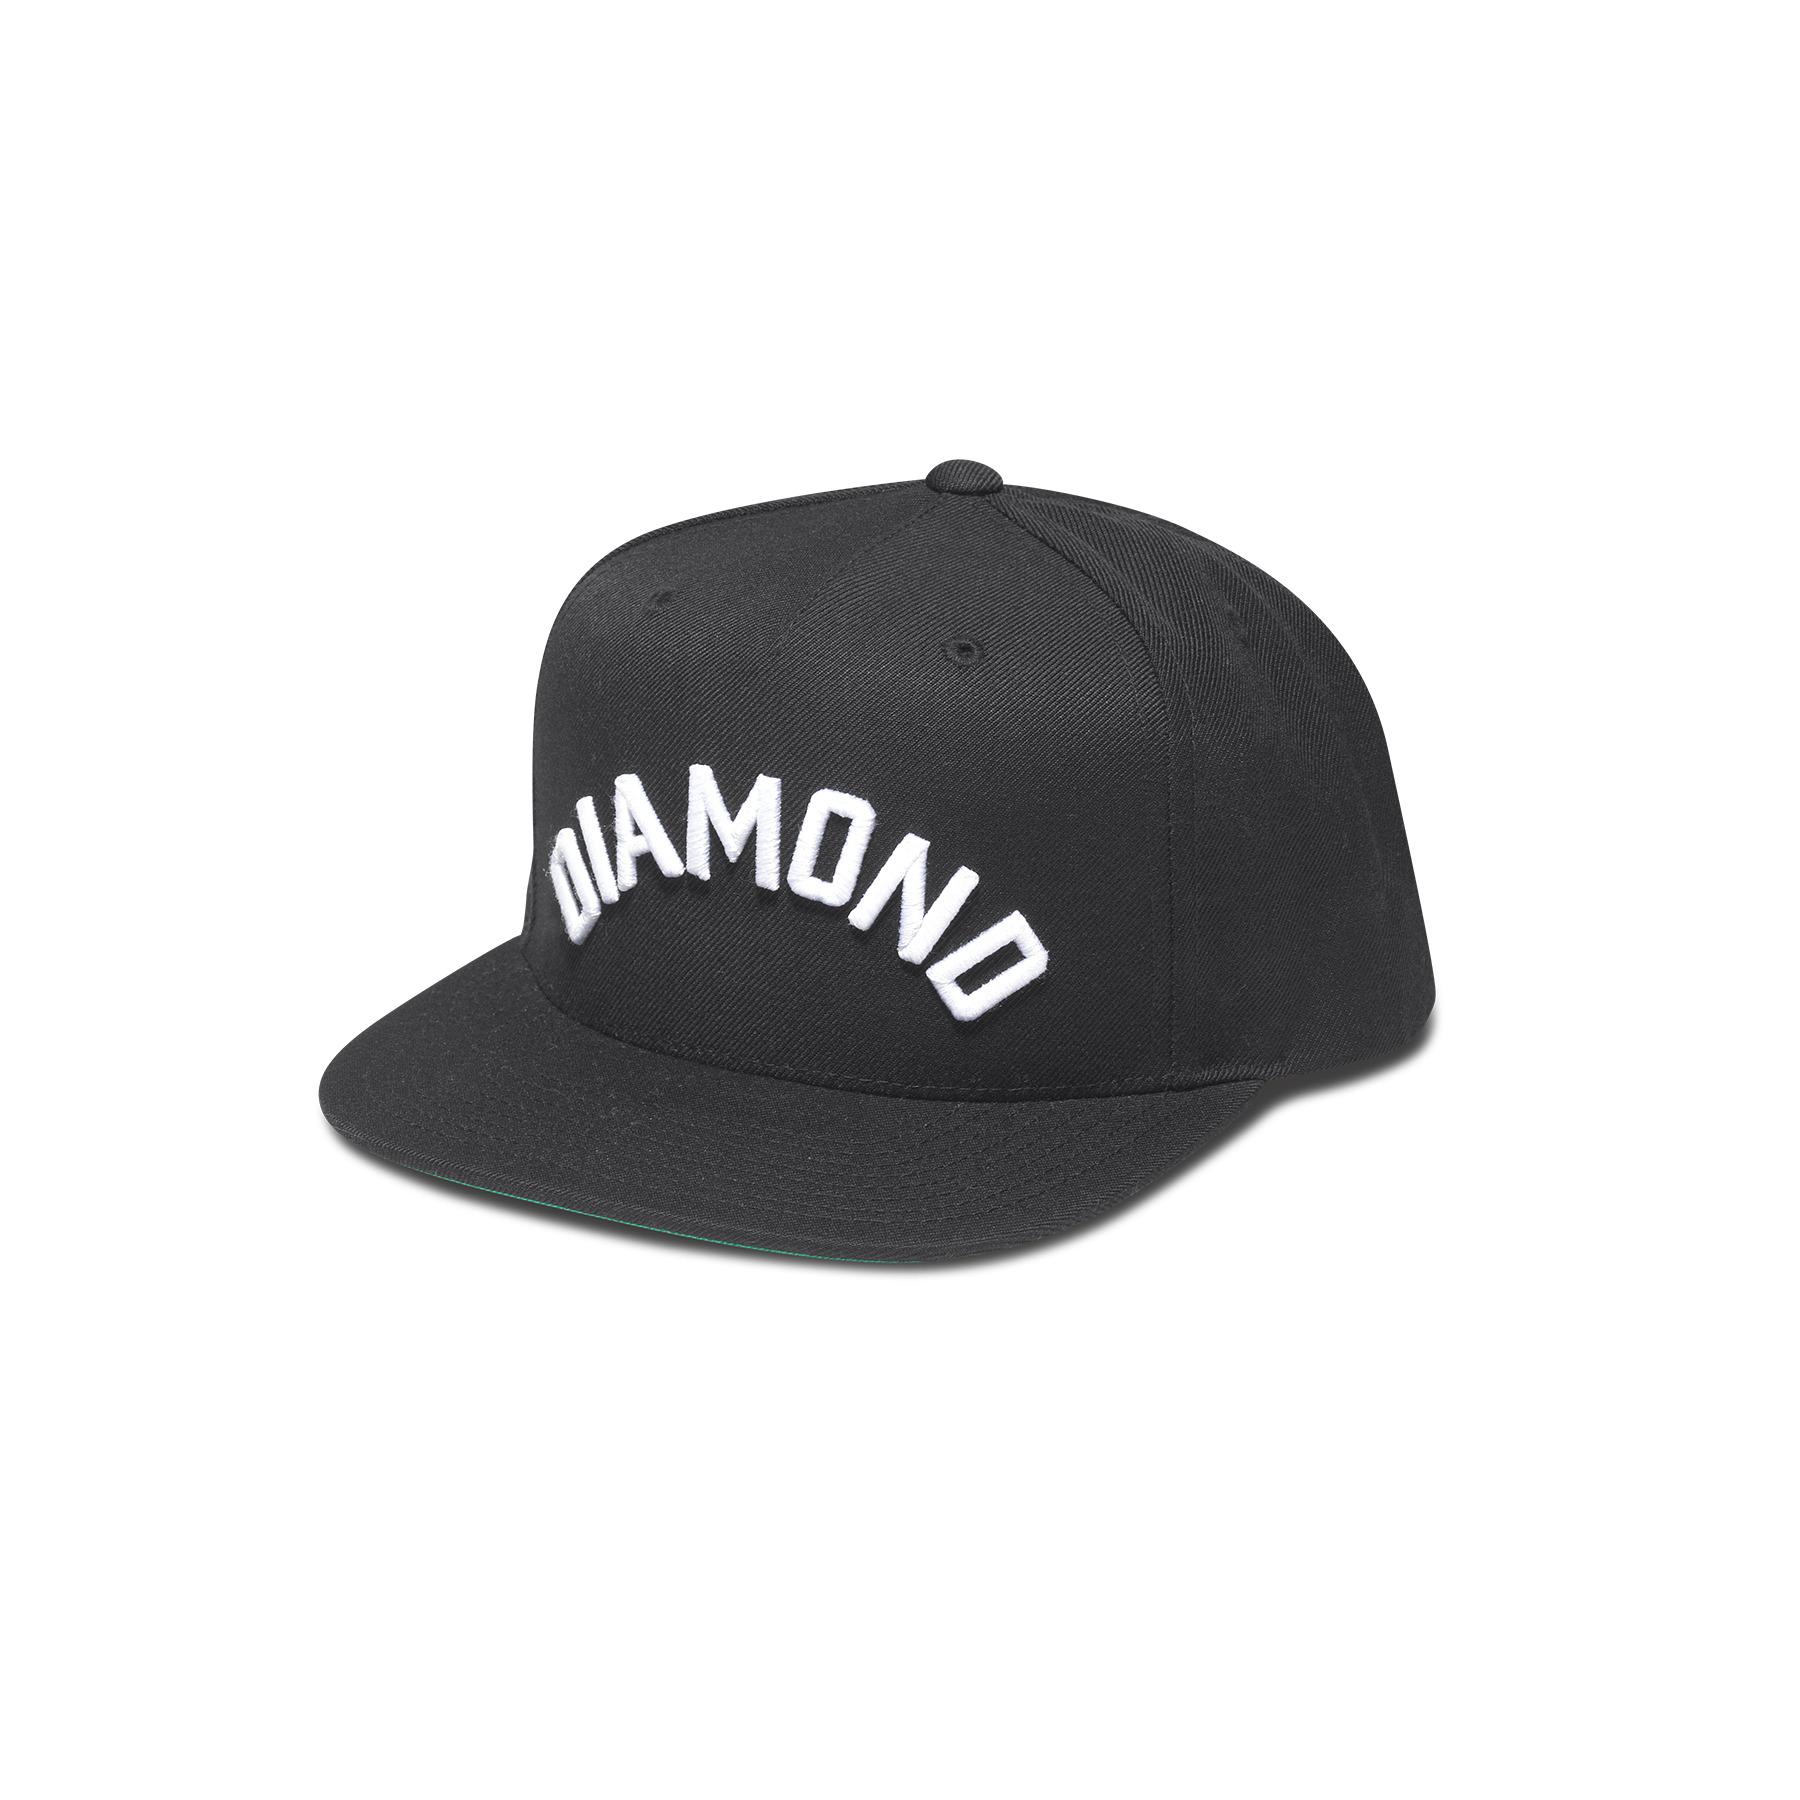 hol_1_headwear_del_1__0008_hat_diamond_arch_snapback_blk.jpg